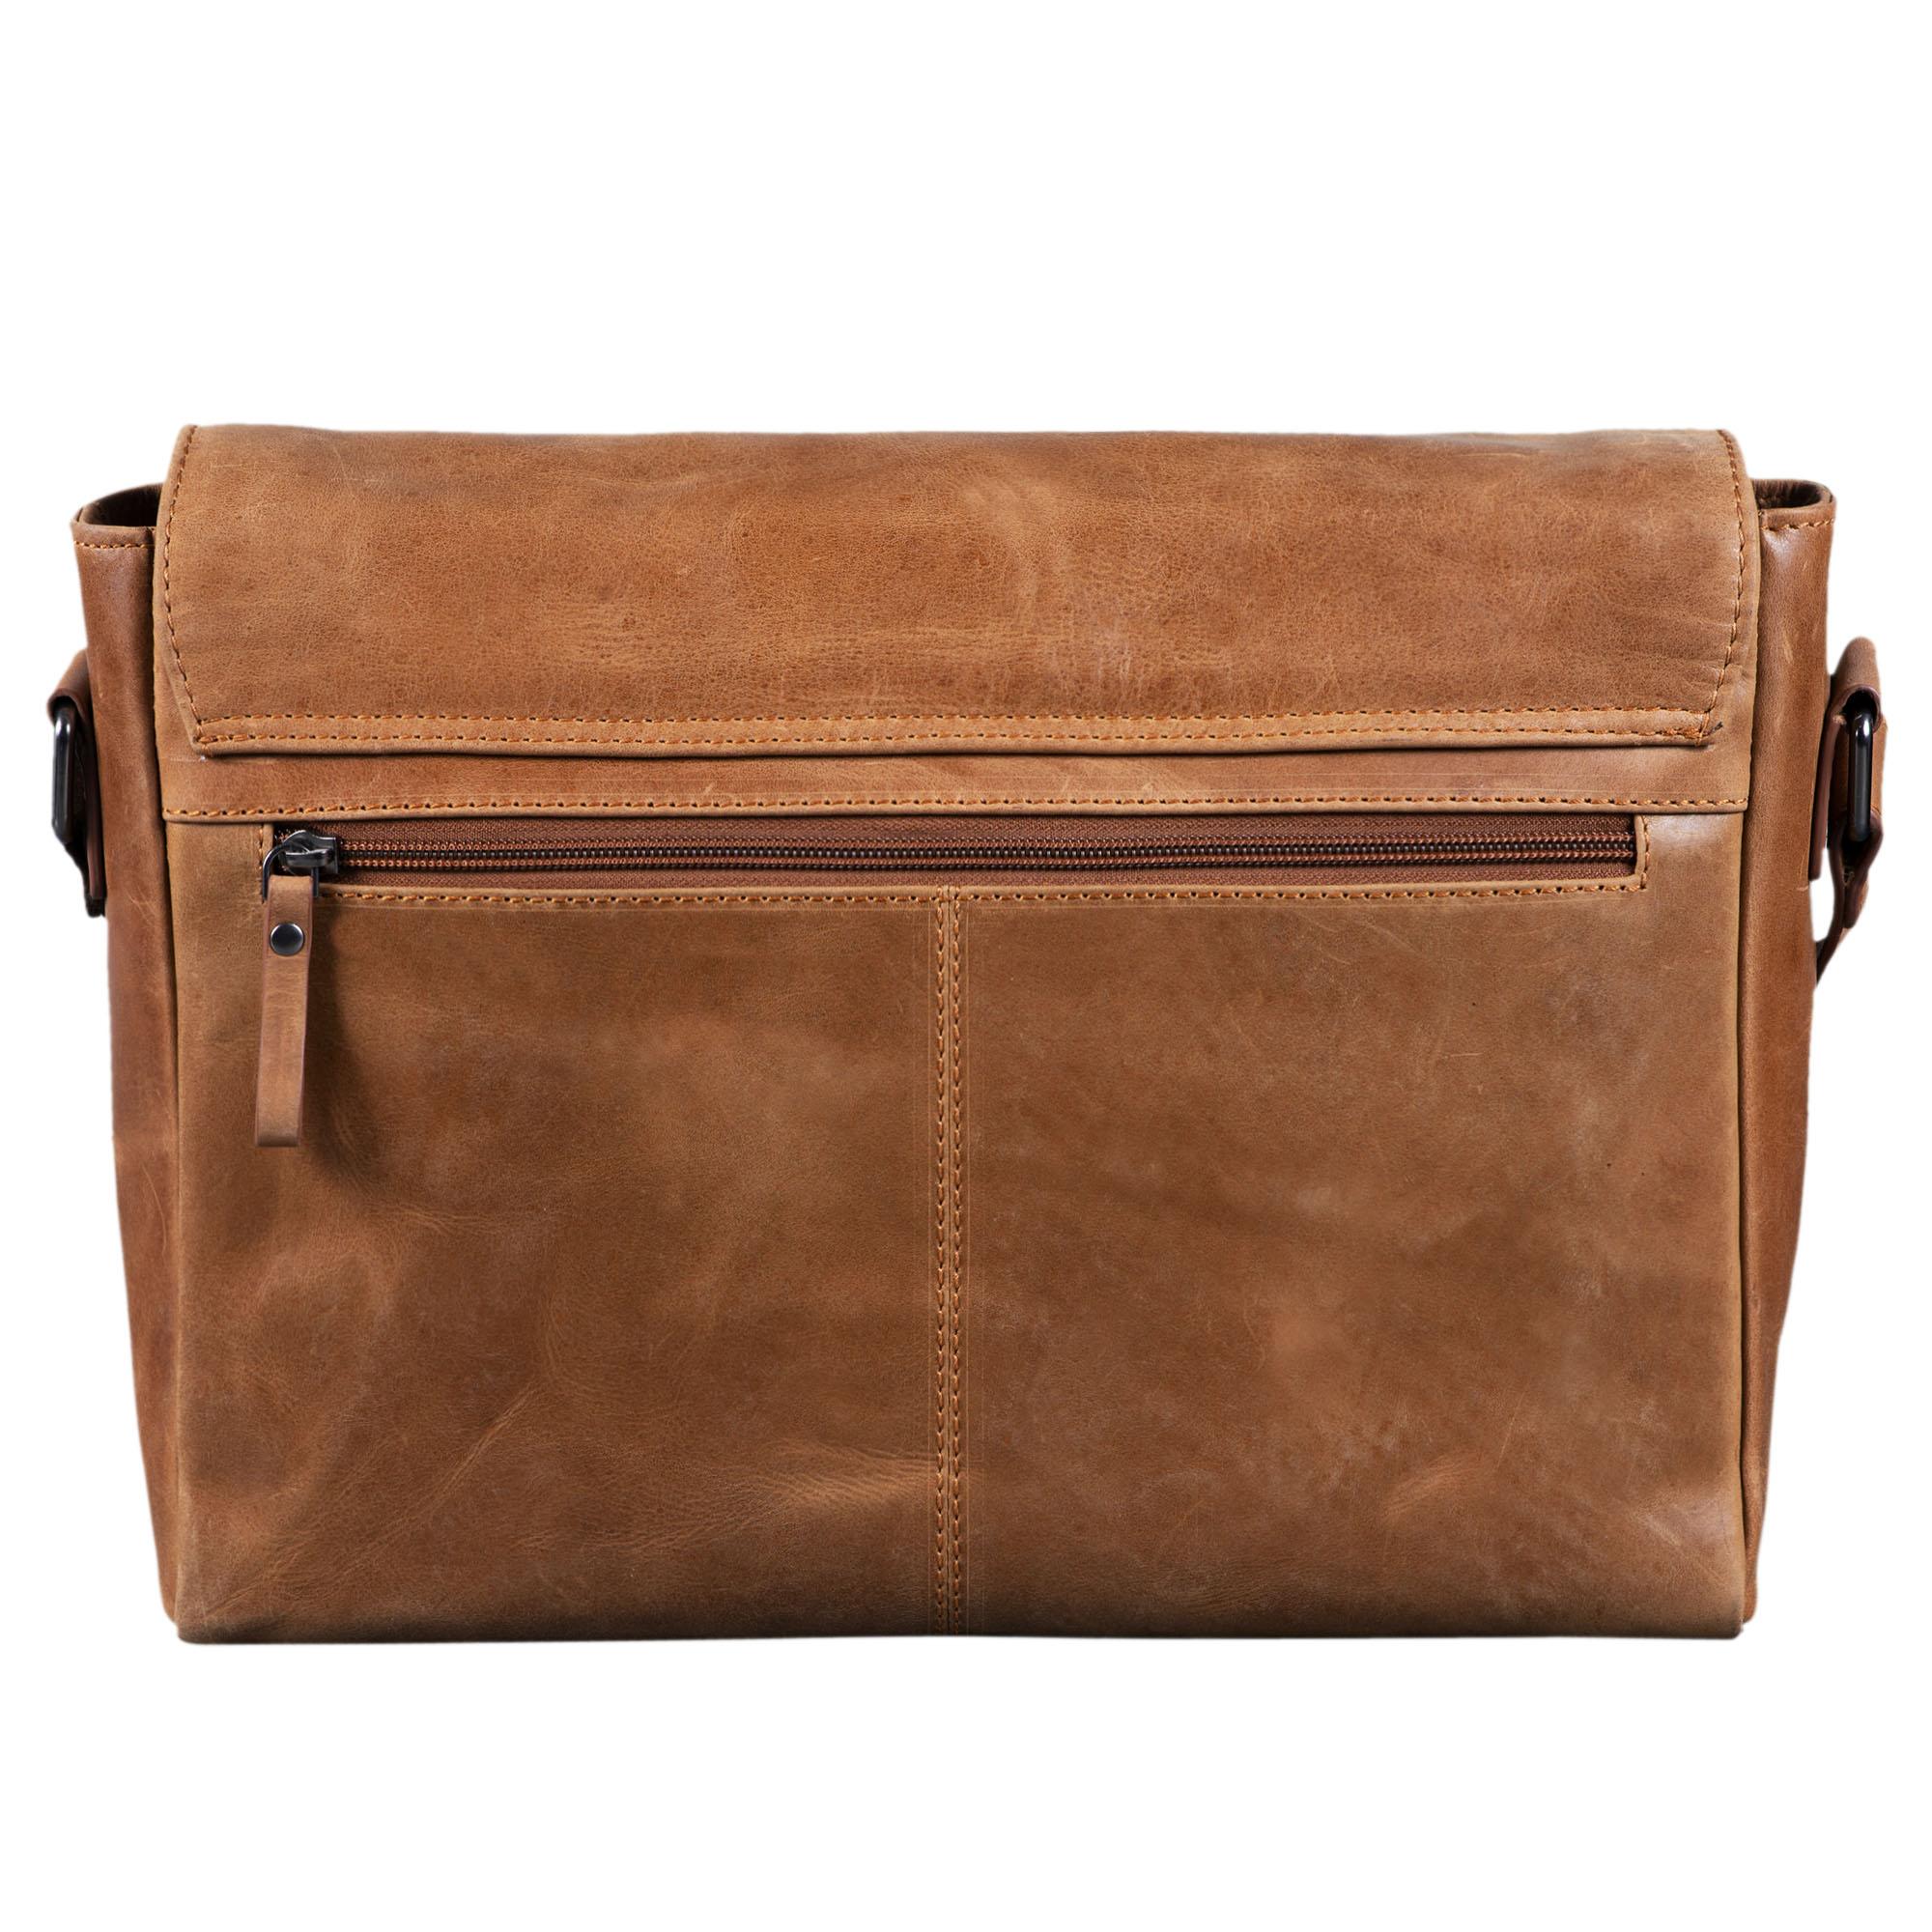 Business Aktentasche Vintage Leder braun